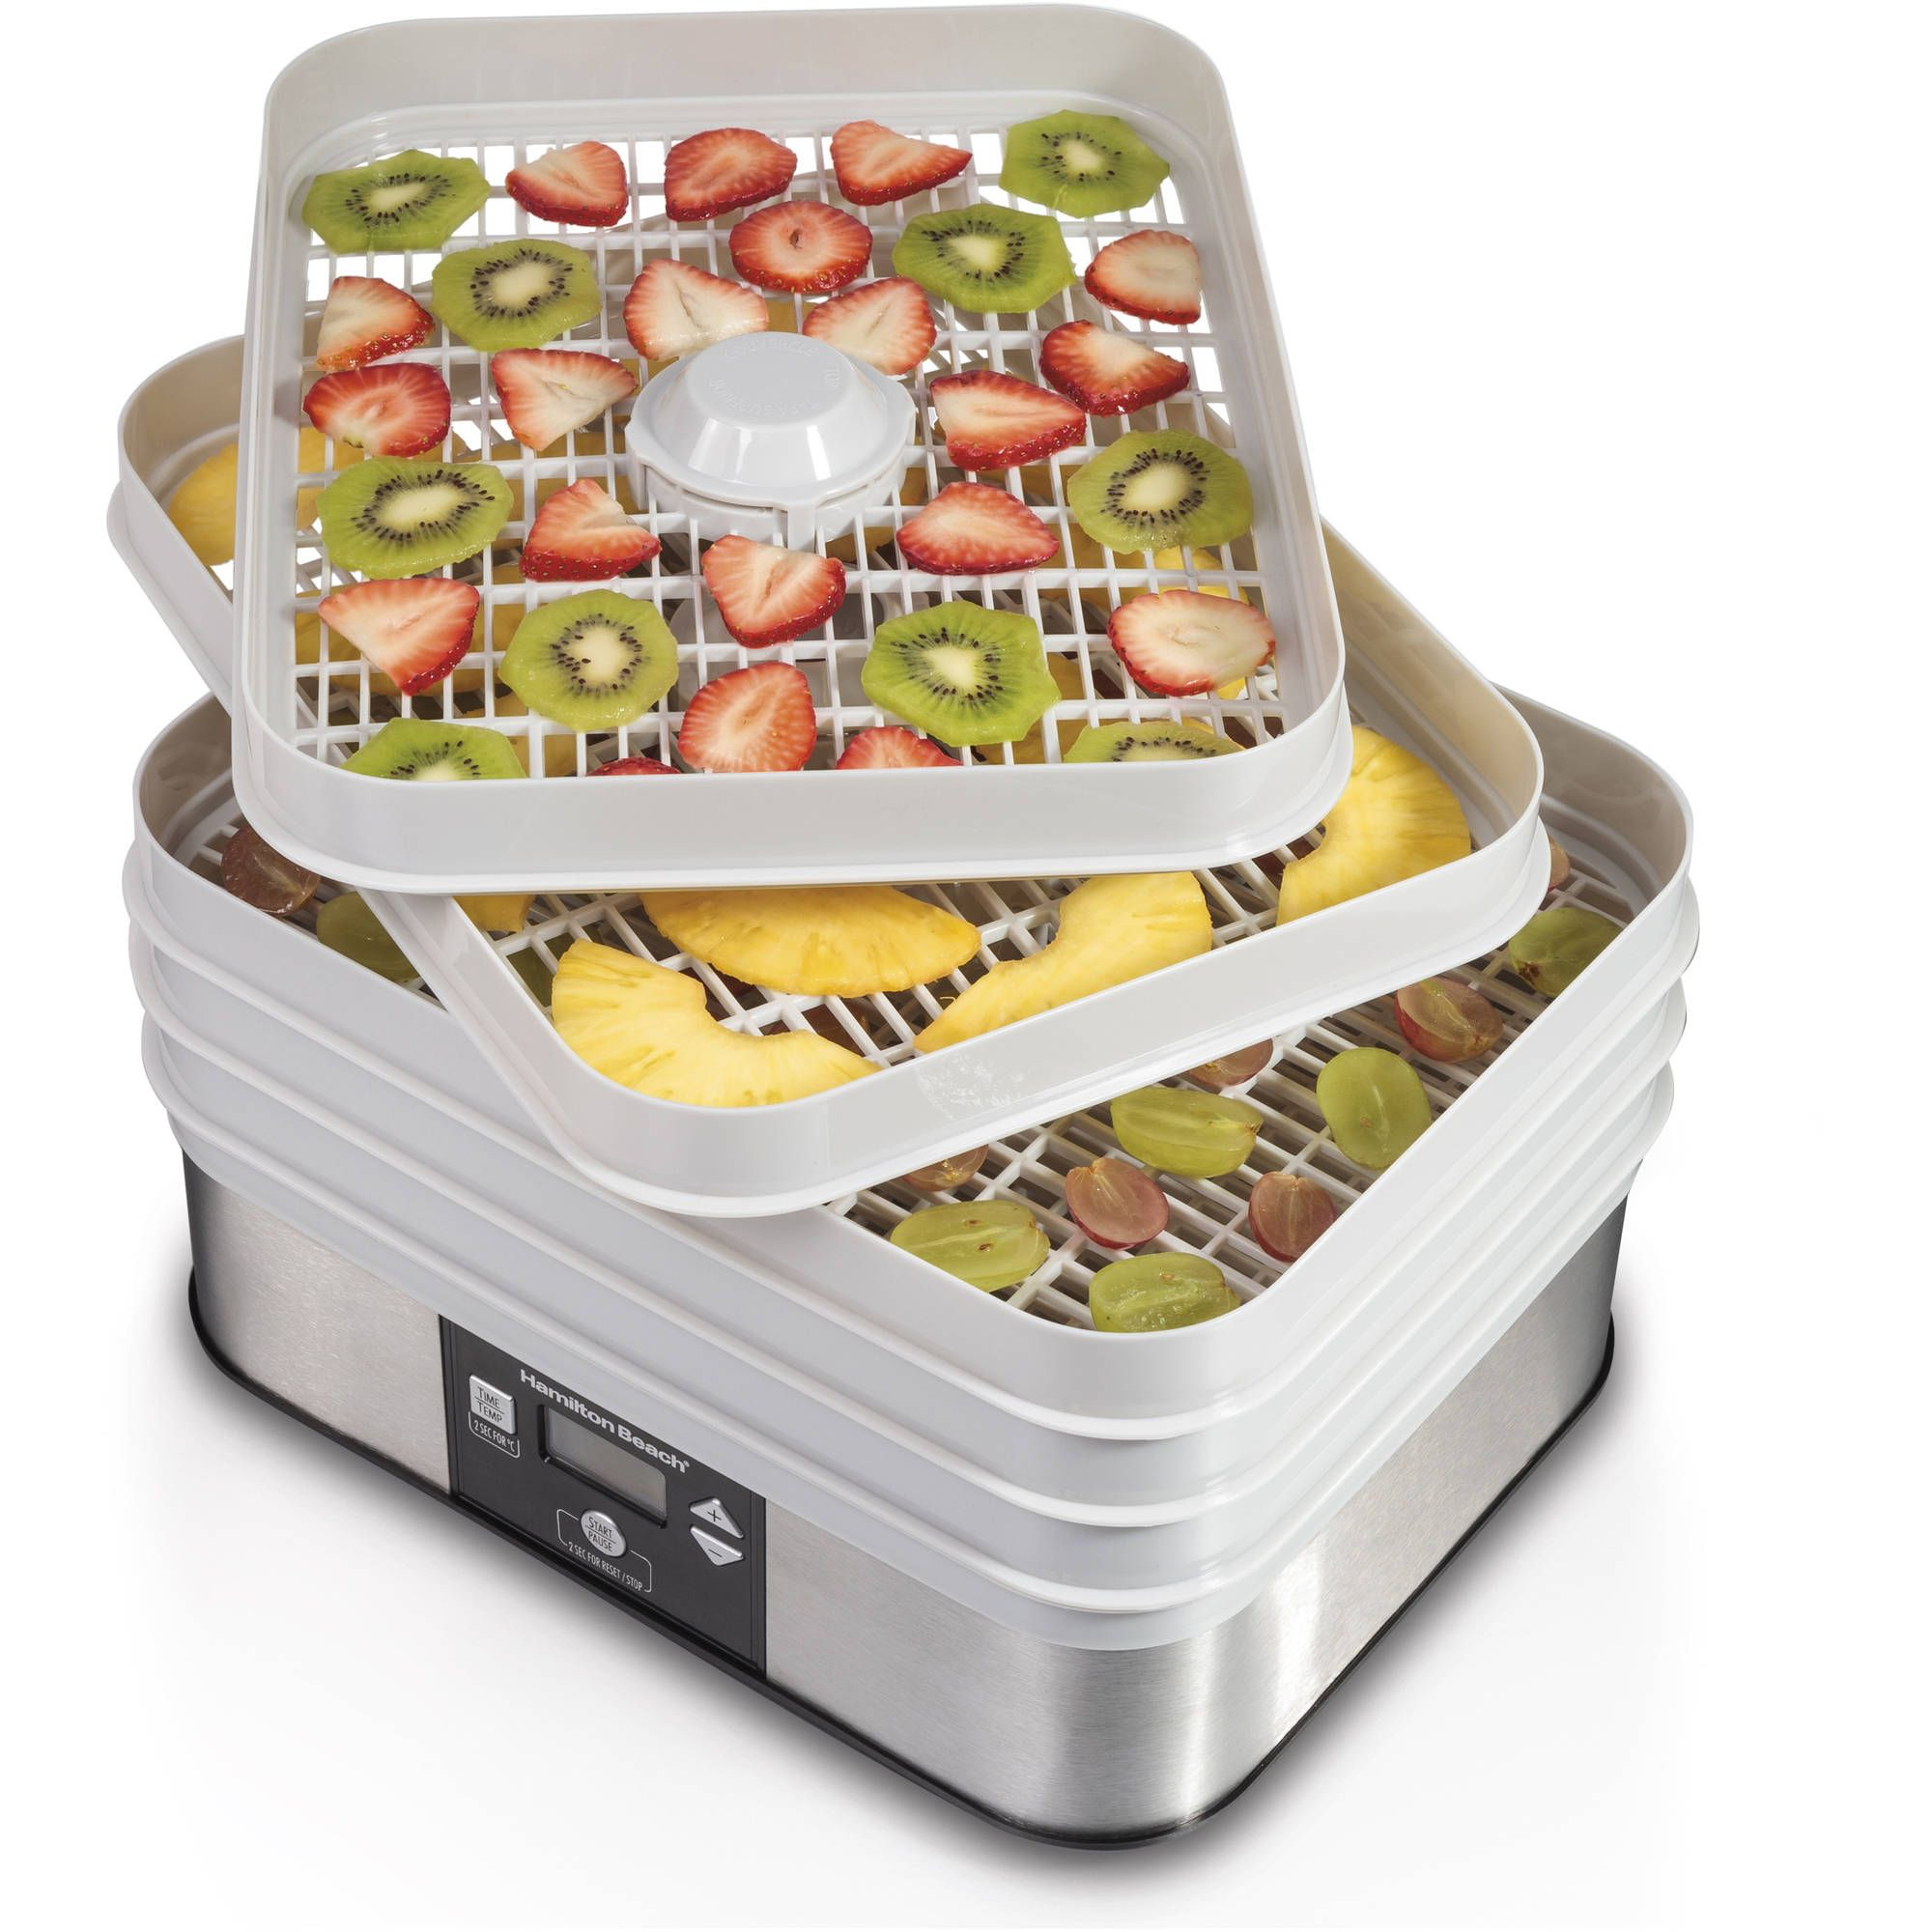 NutriChef PKFD32 Countertop Digital Food Dehydrator Multi-Tier Stackable Trays